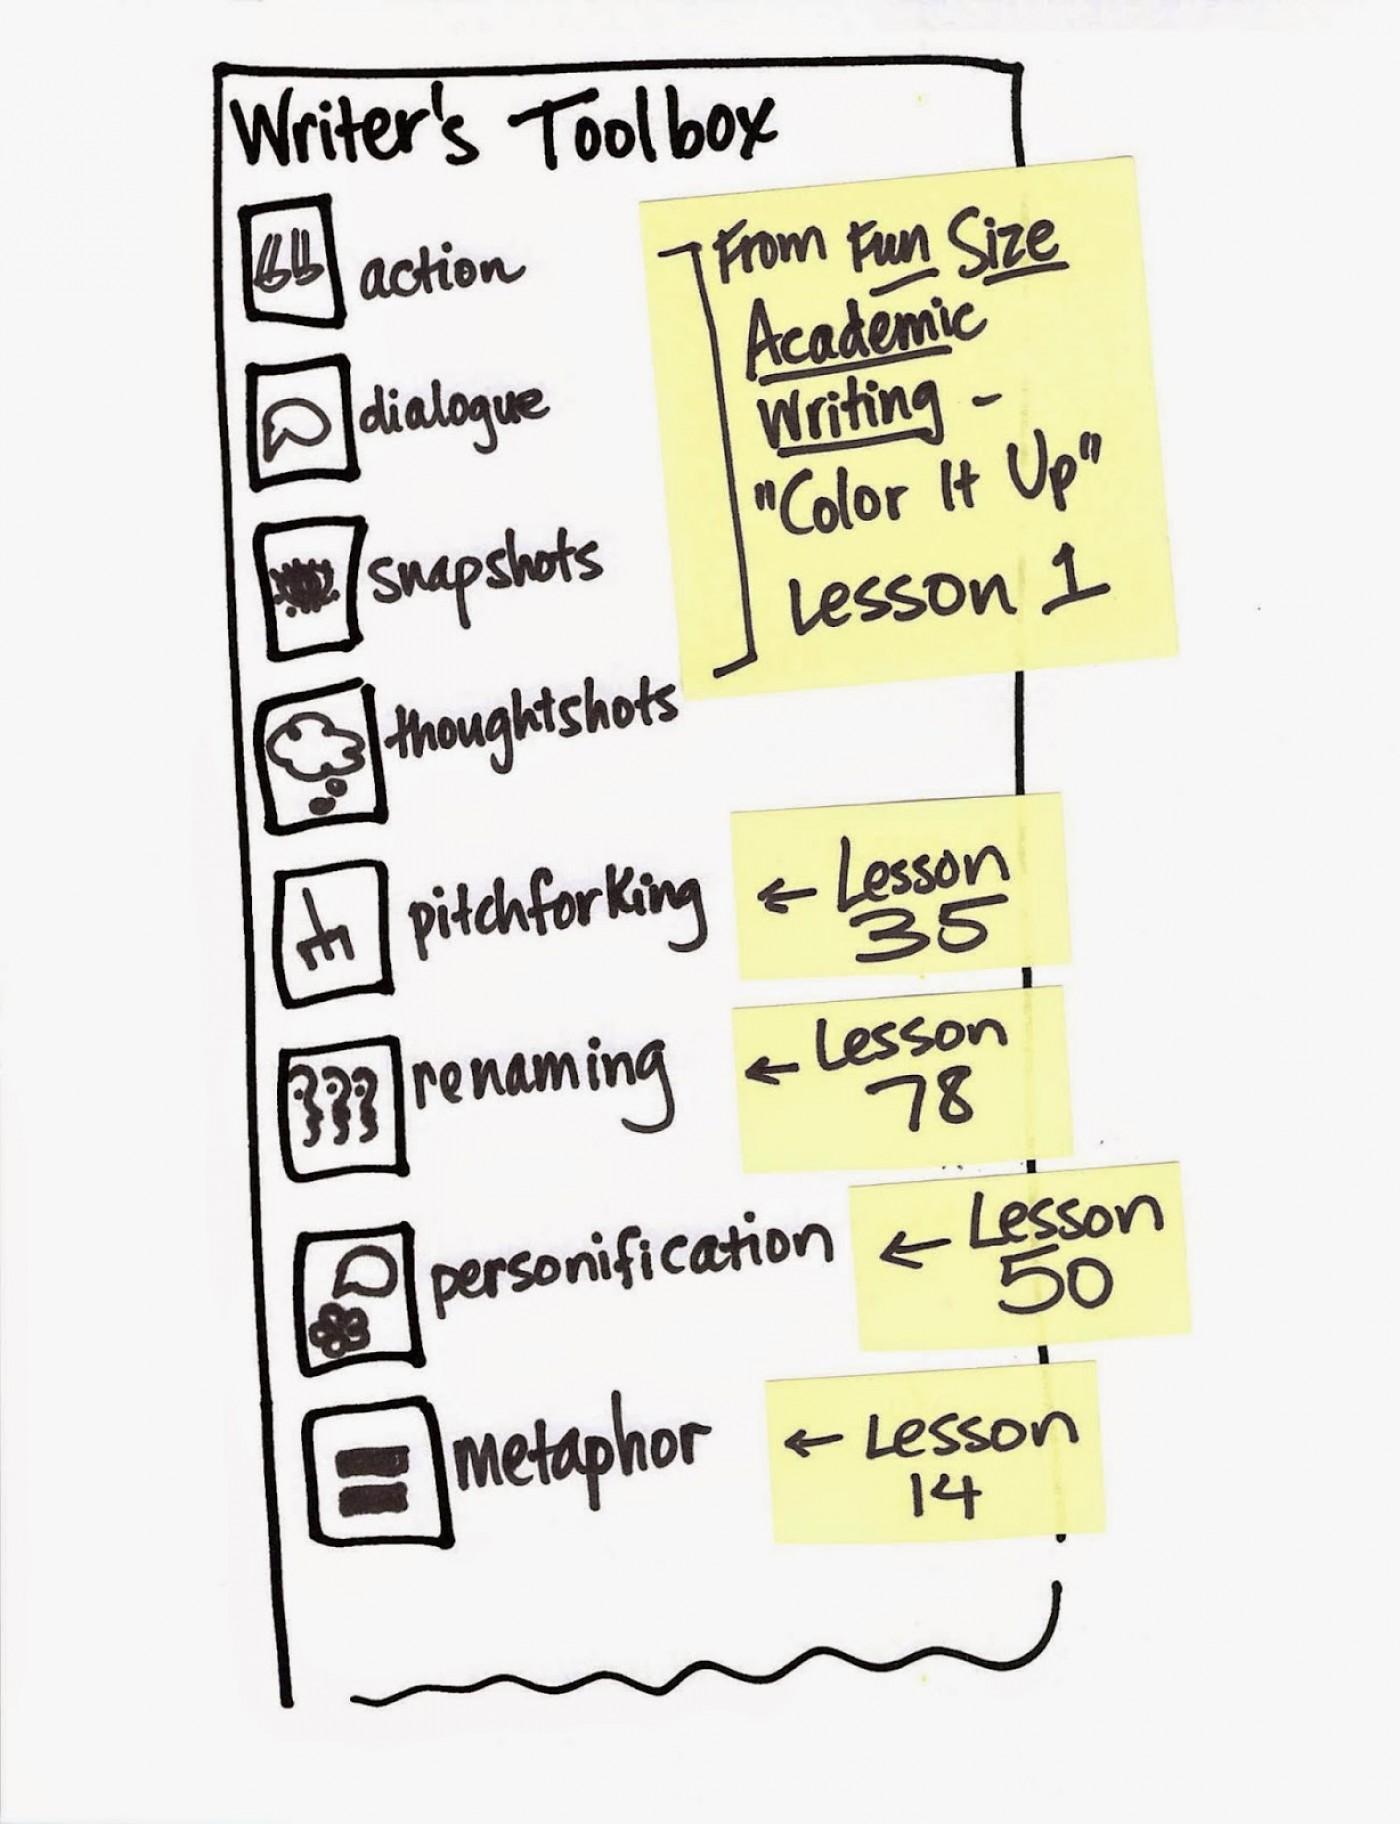 024 Essay Rewriter Example Rewrite My Rewriting Tool Writing On Article Best Tools Wr Essential Free Online College Singular Software Crack Generator 1400